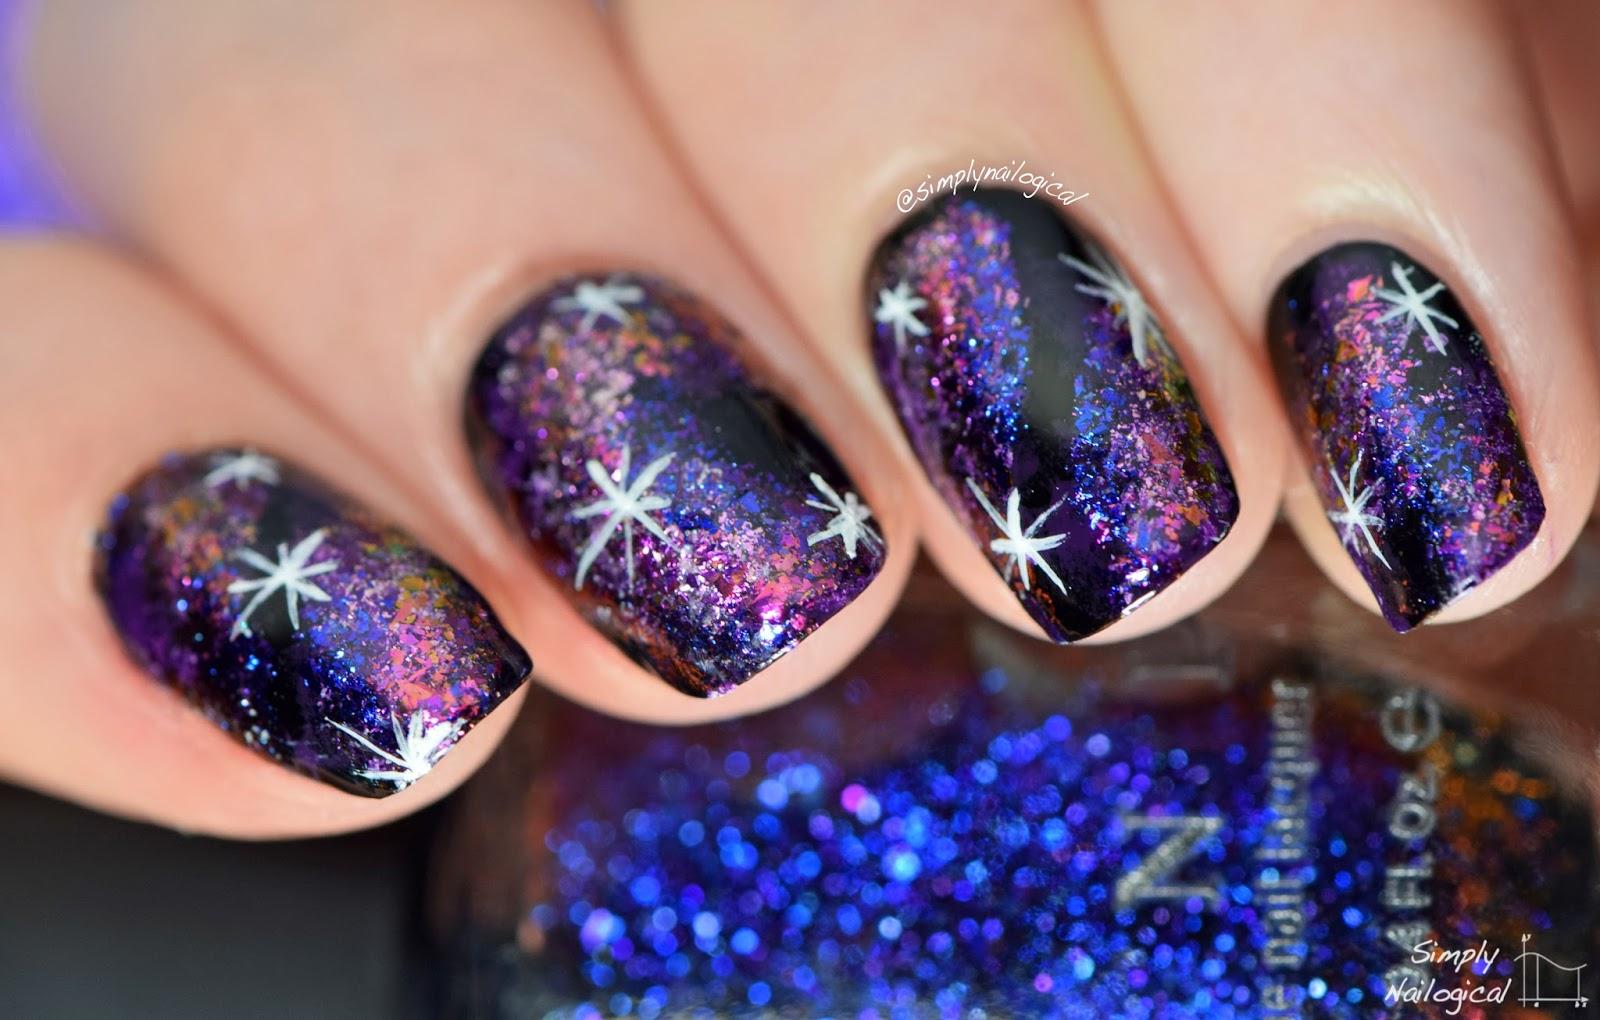 Simply Nailogical: Dark galaxy nails using ultra-chrome flakies